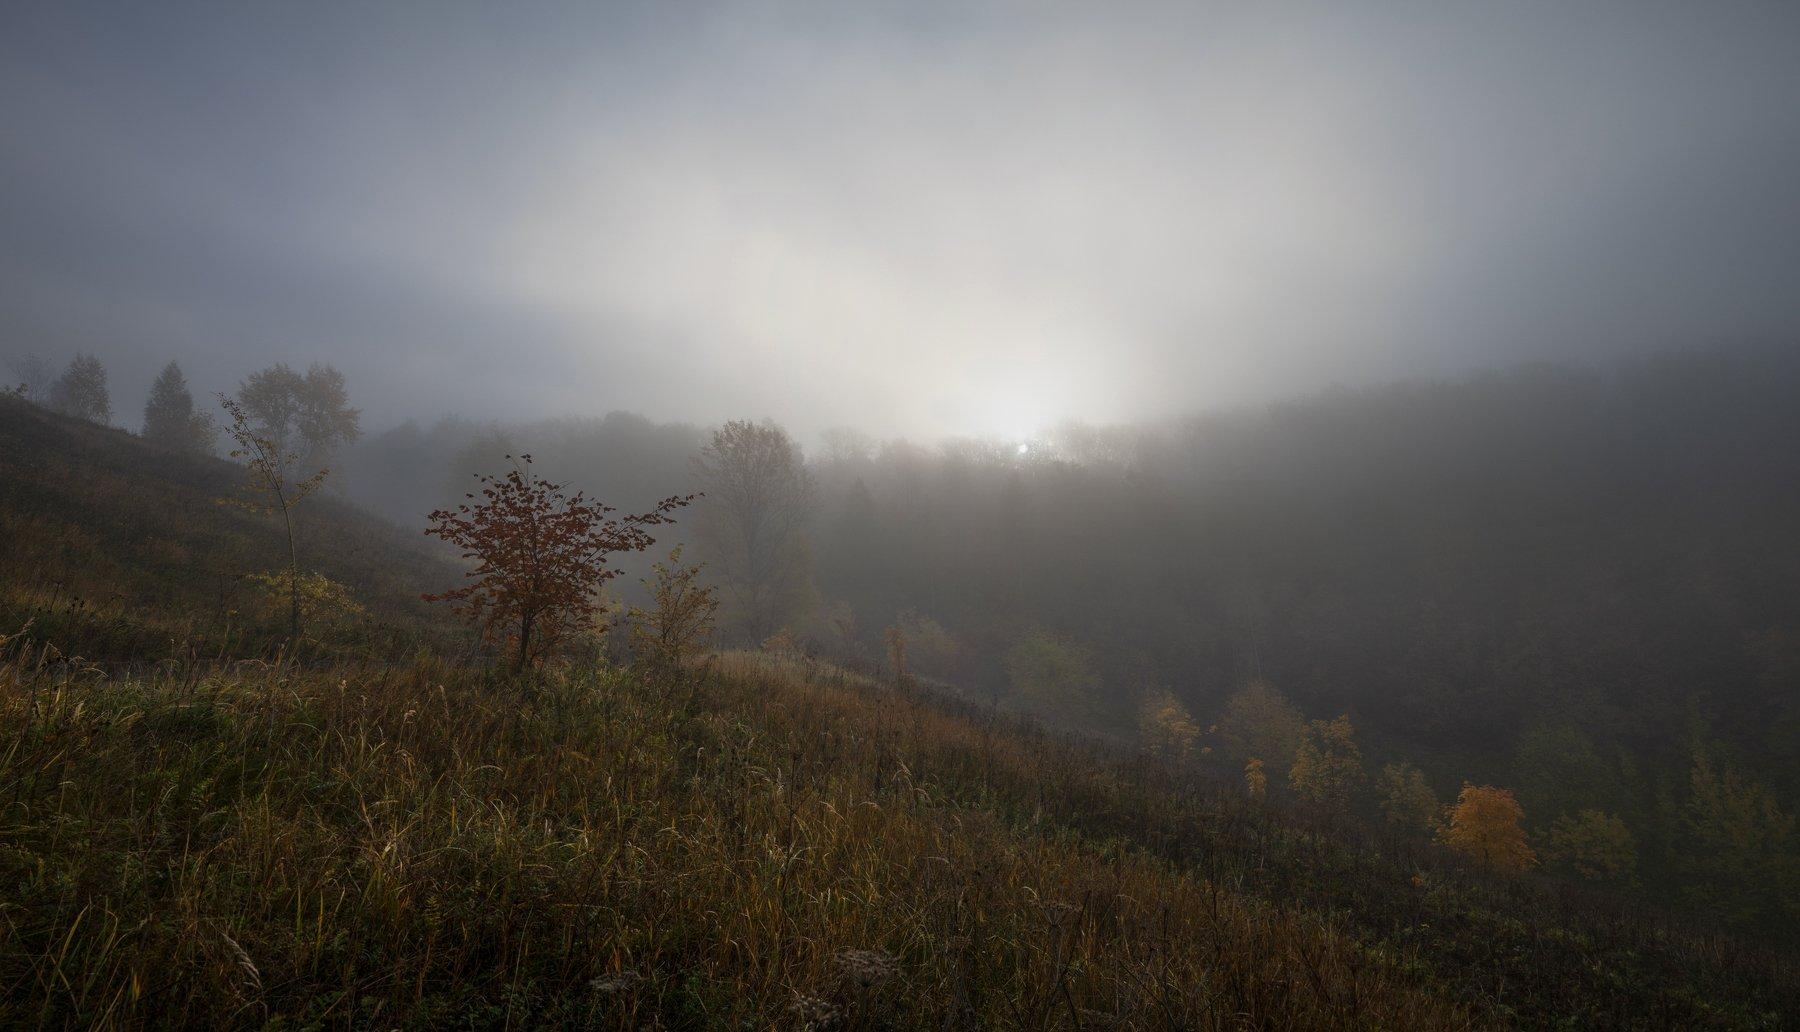 октябрь утро, Колесов Андрей